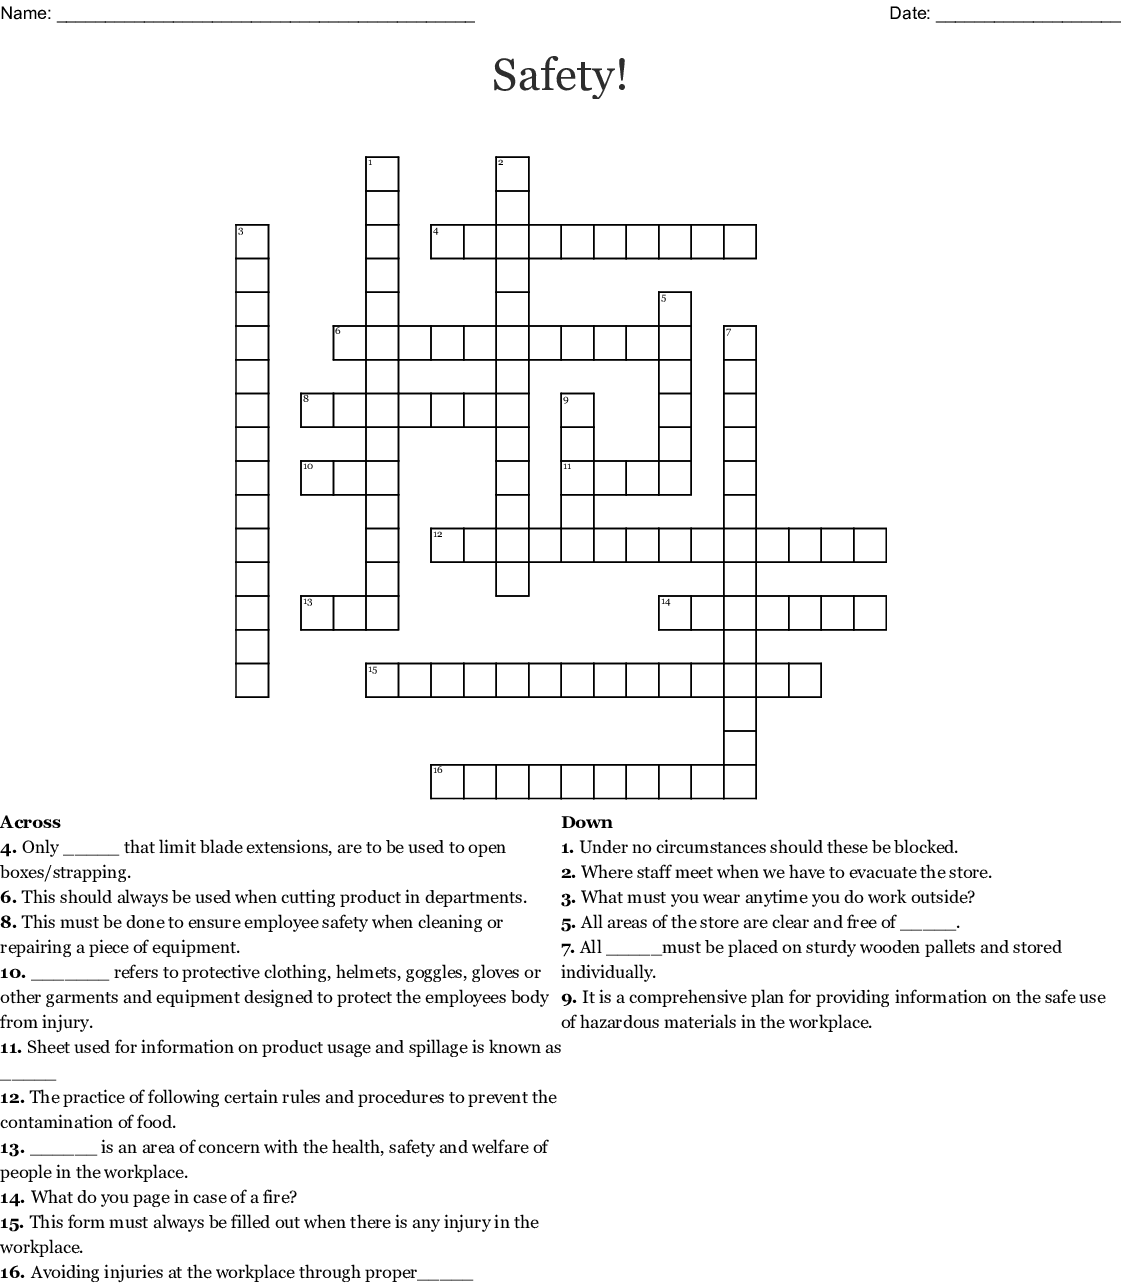 Safety Crossword